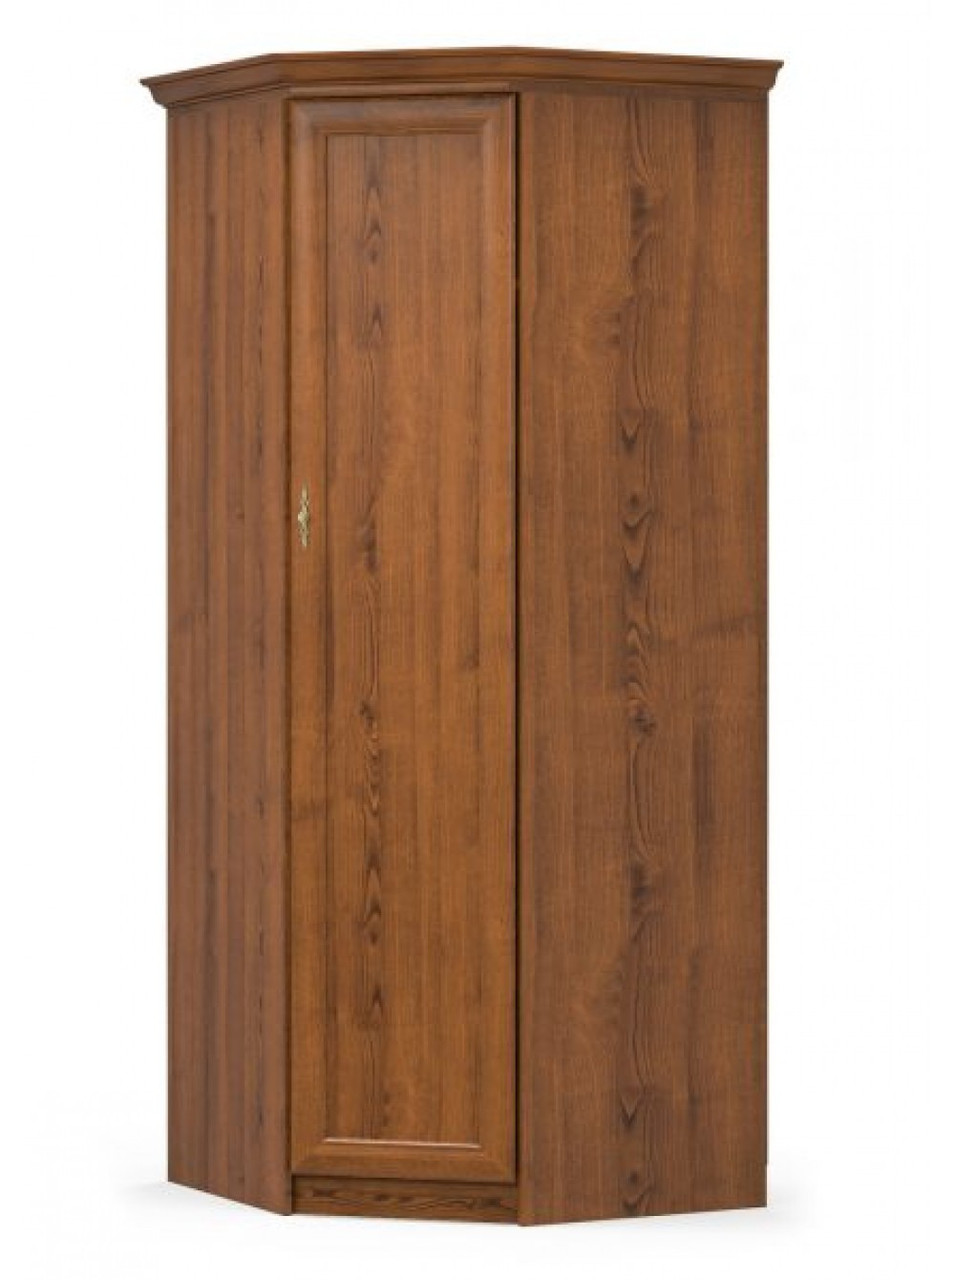 Угловой шкаф Даллас вишня Мебель-сервис